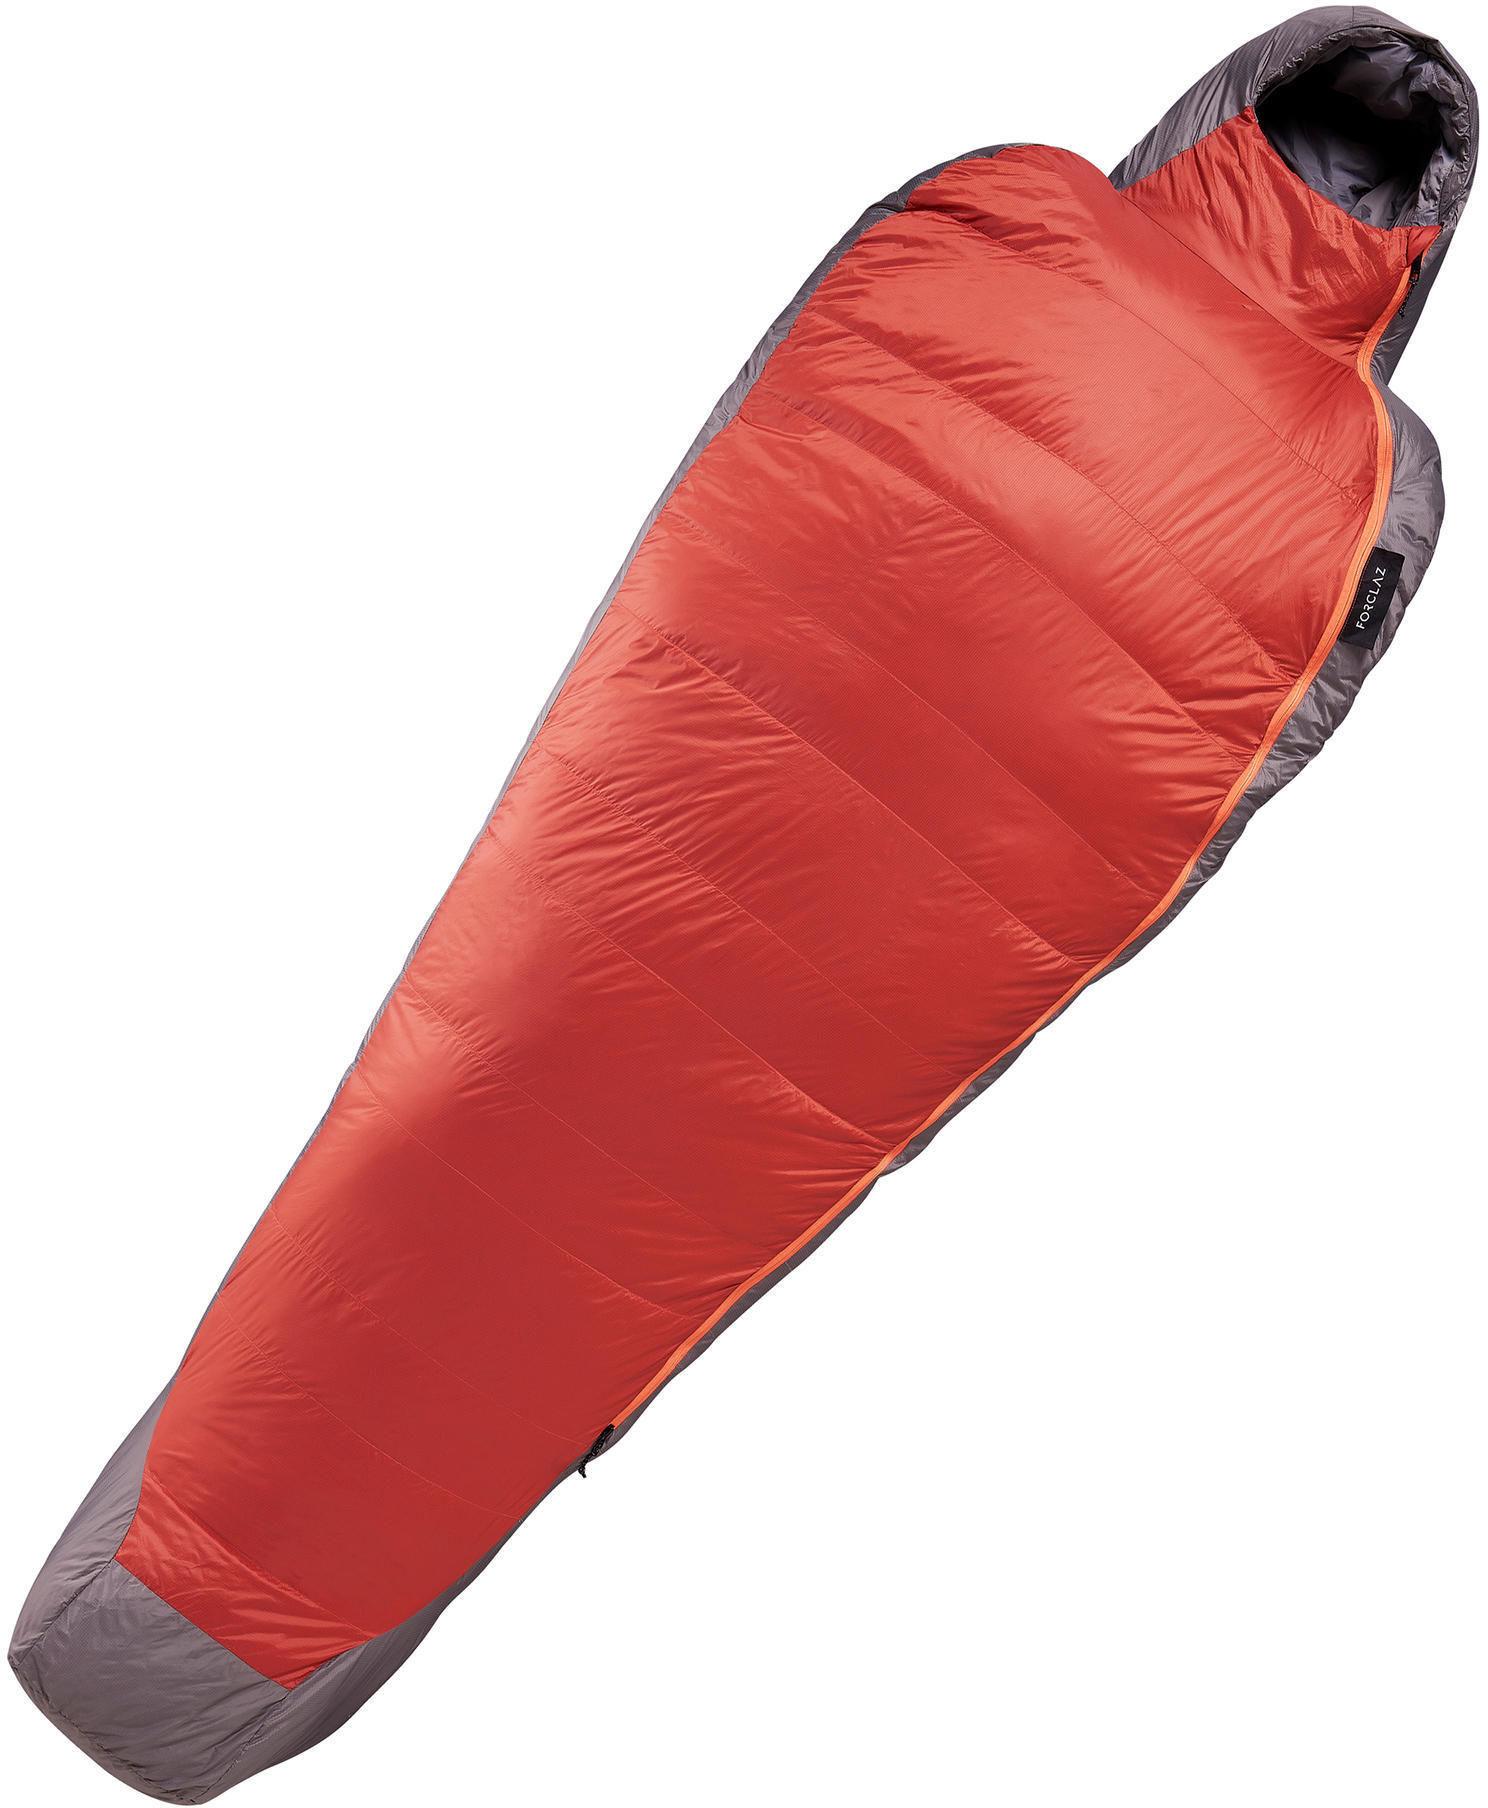 Śpiwór trekkingowy - TREK 900 0 C